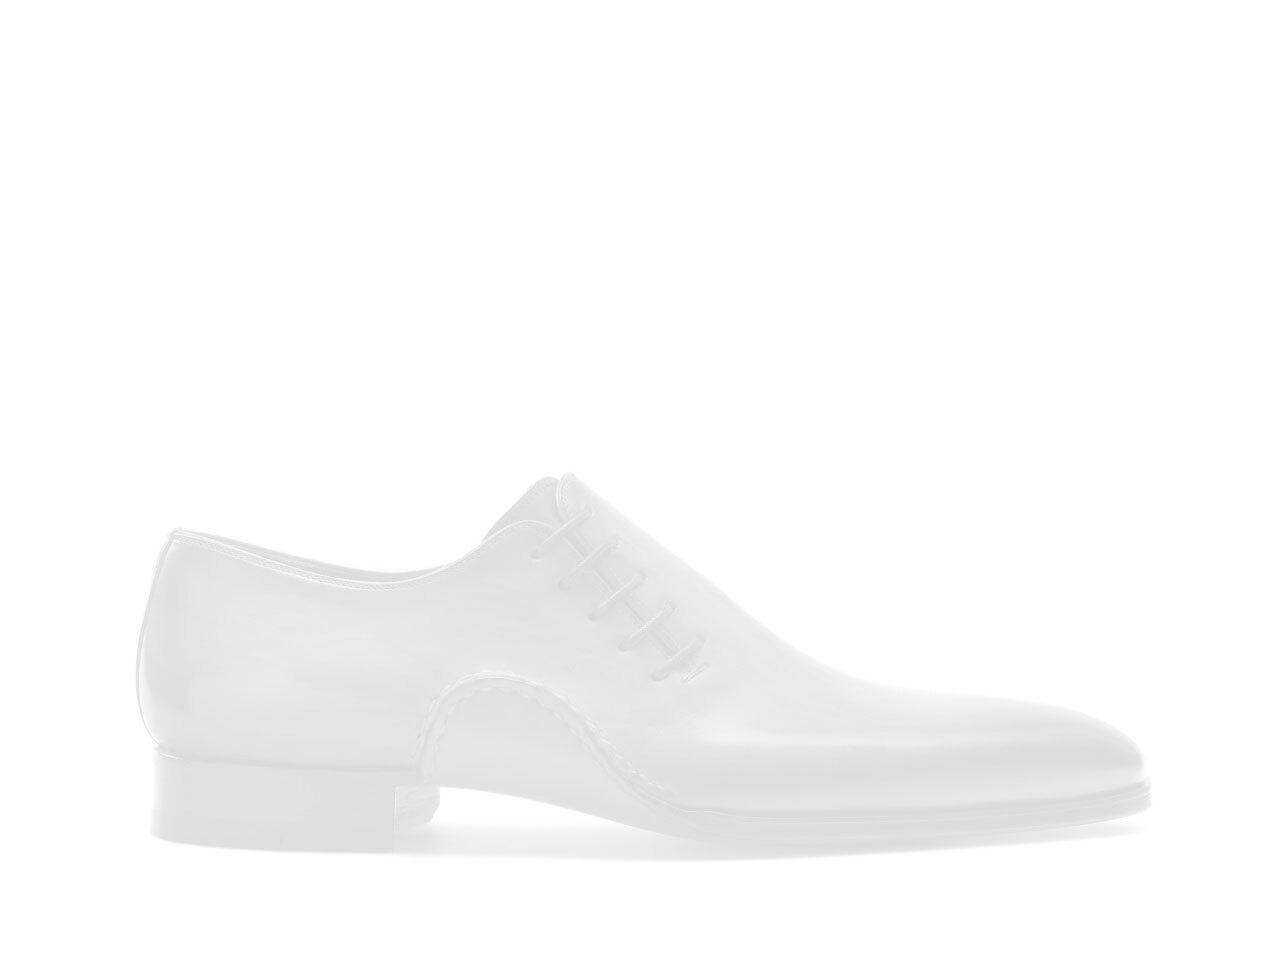 Cuero light brown leather wholecut lace up shoes for men - Magnanni